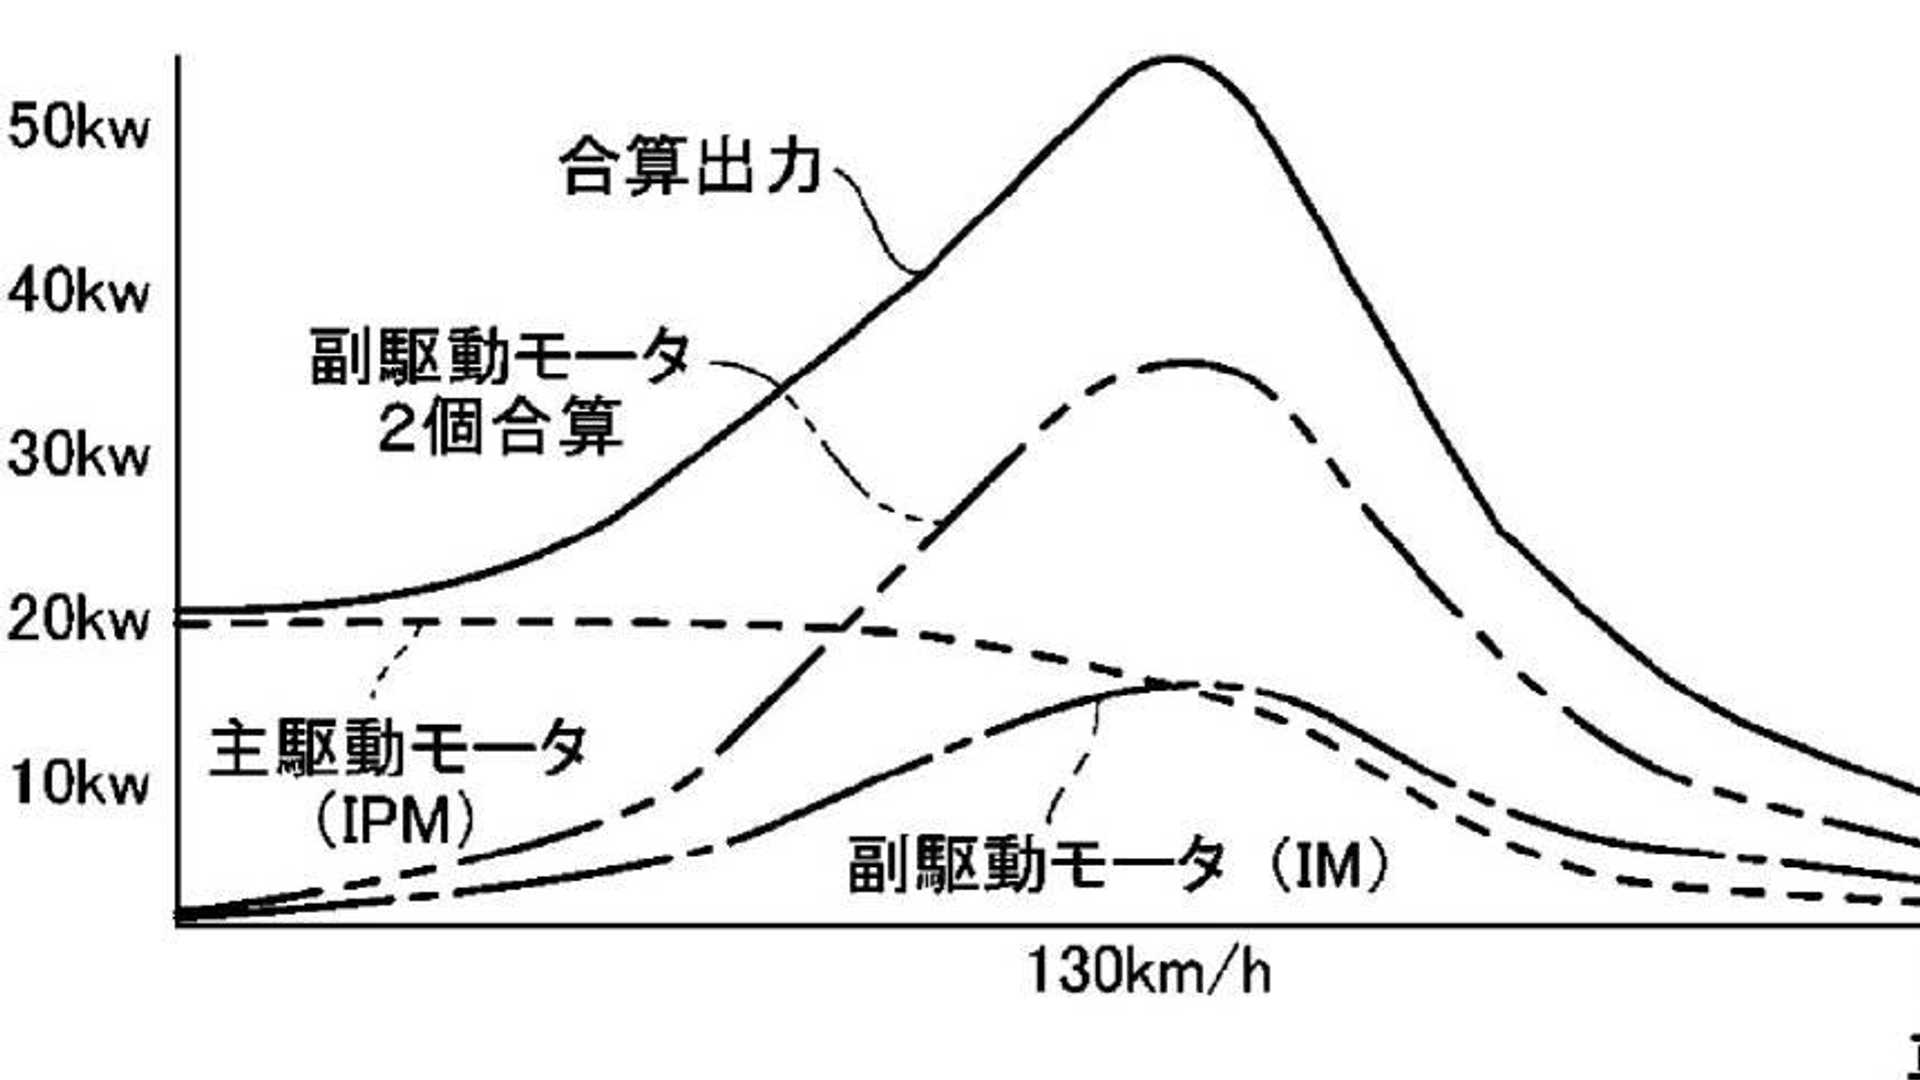 Mazda-Rotary-Engine-Hybrid-Patent-7